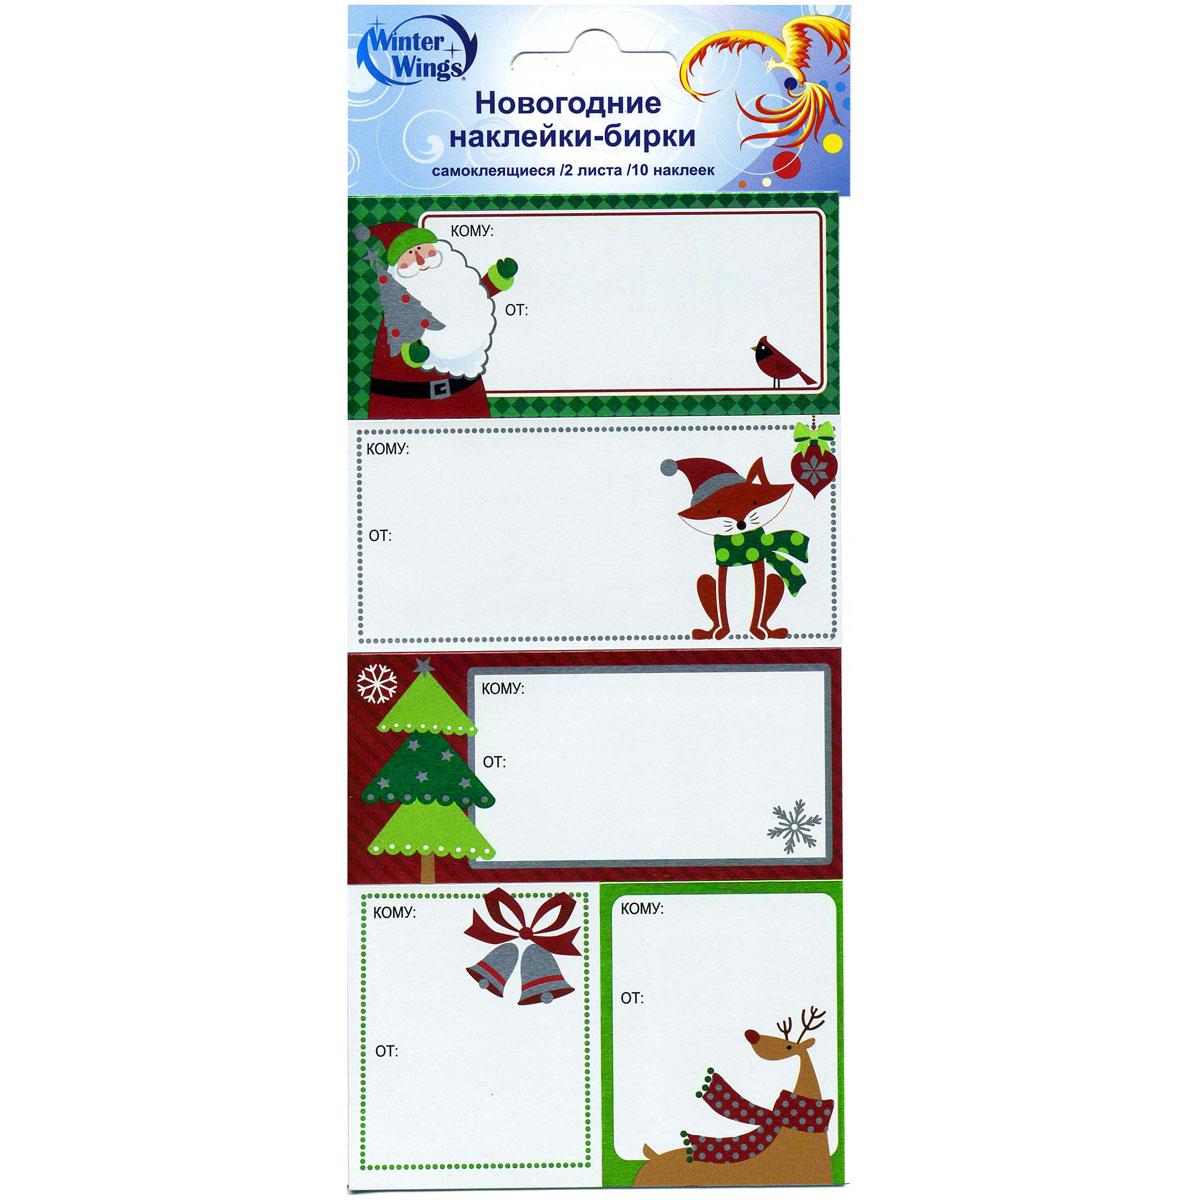 Набор наклеек для оформления подарков Winter Wings, 10 х 20 см, 2 листа. N09380N09380Набор наклеек для оформления подарков, 10*20 см, 2 листа, ПВХ_